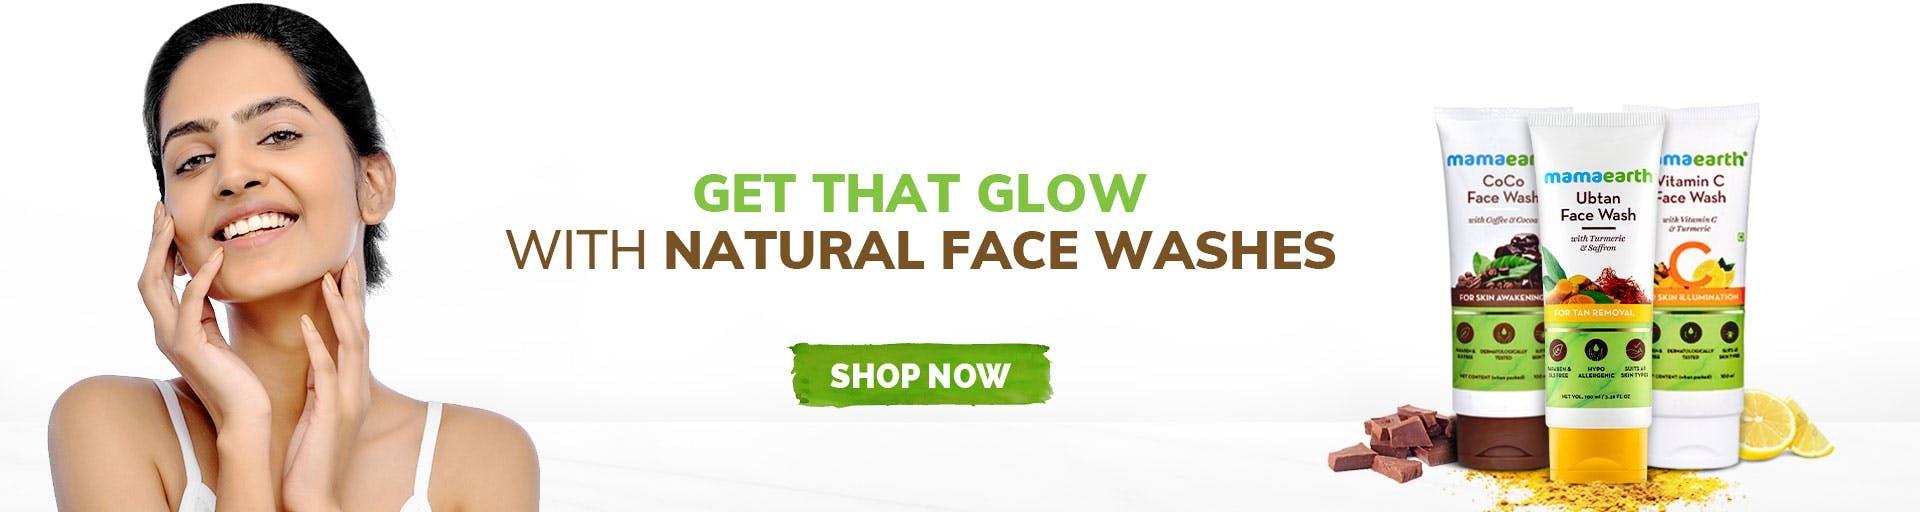 mamaearth.in - Mamaearth Face Wash starting at just ₹249